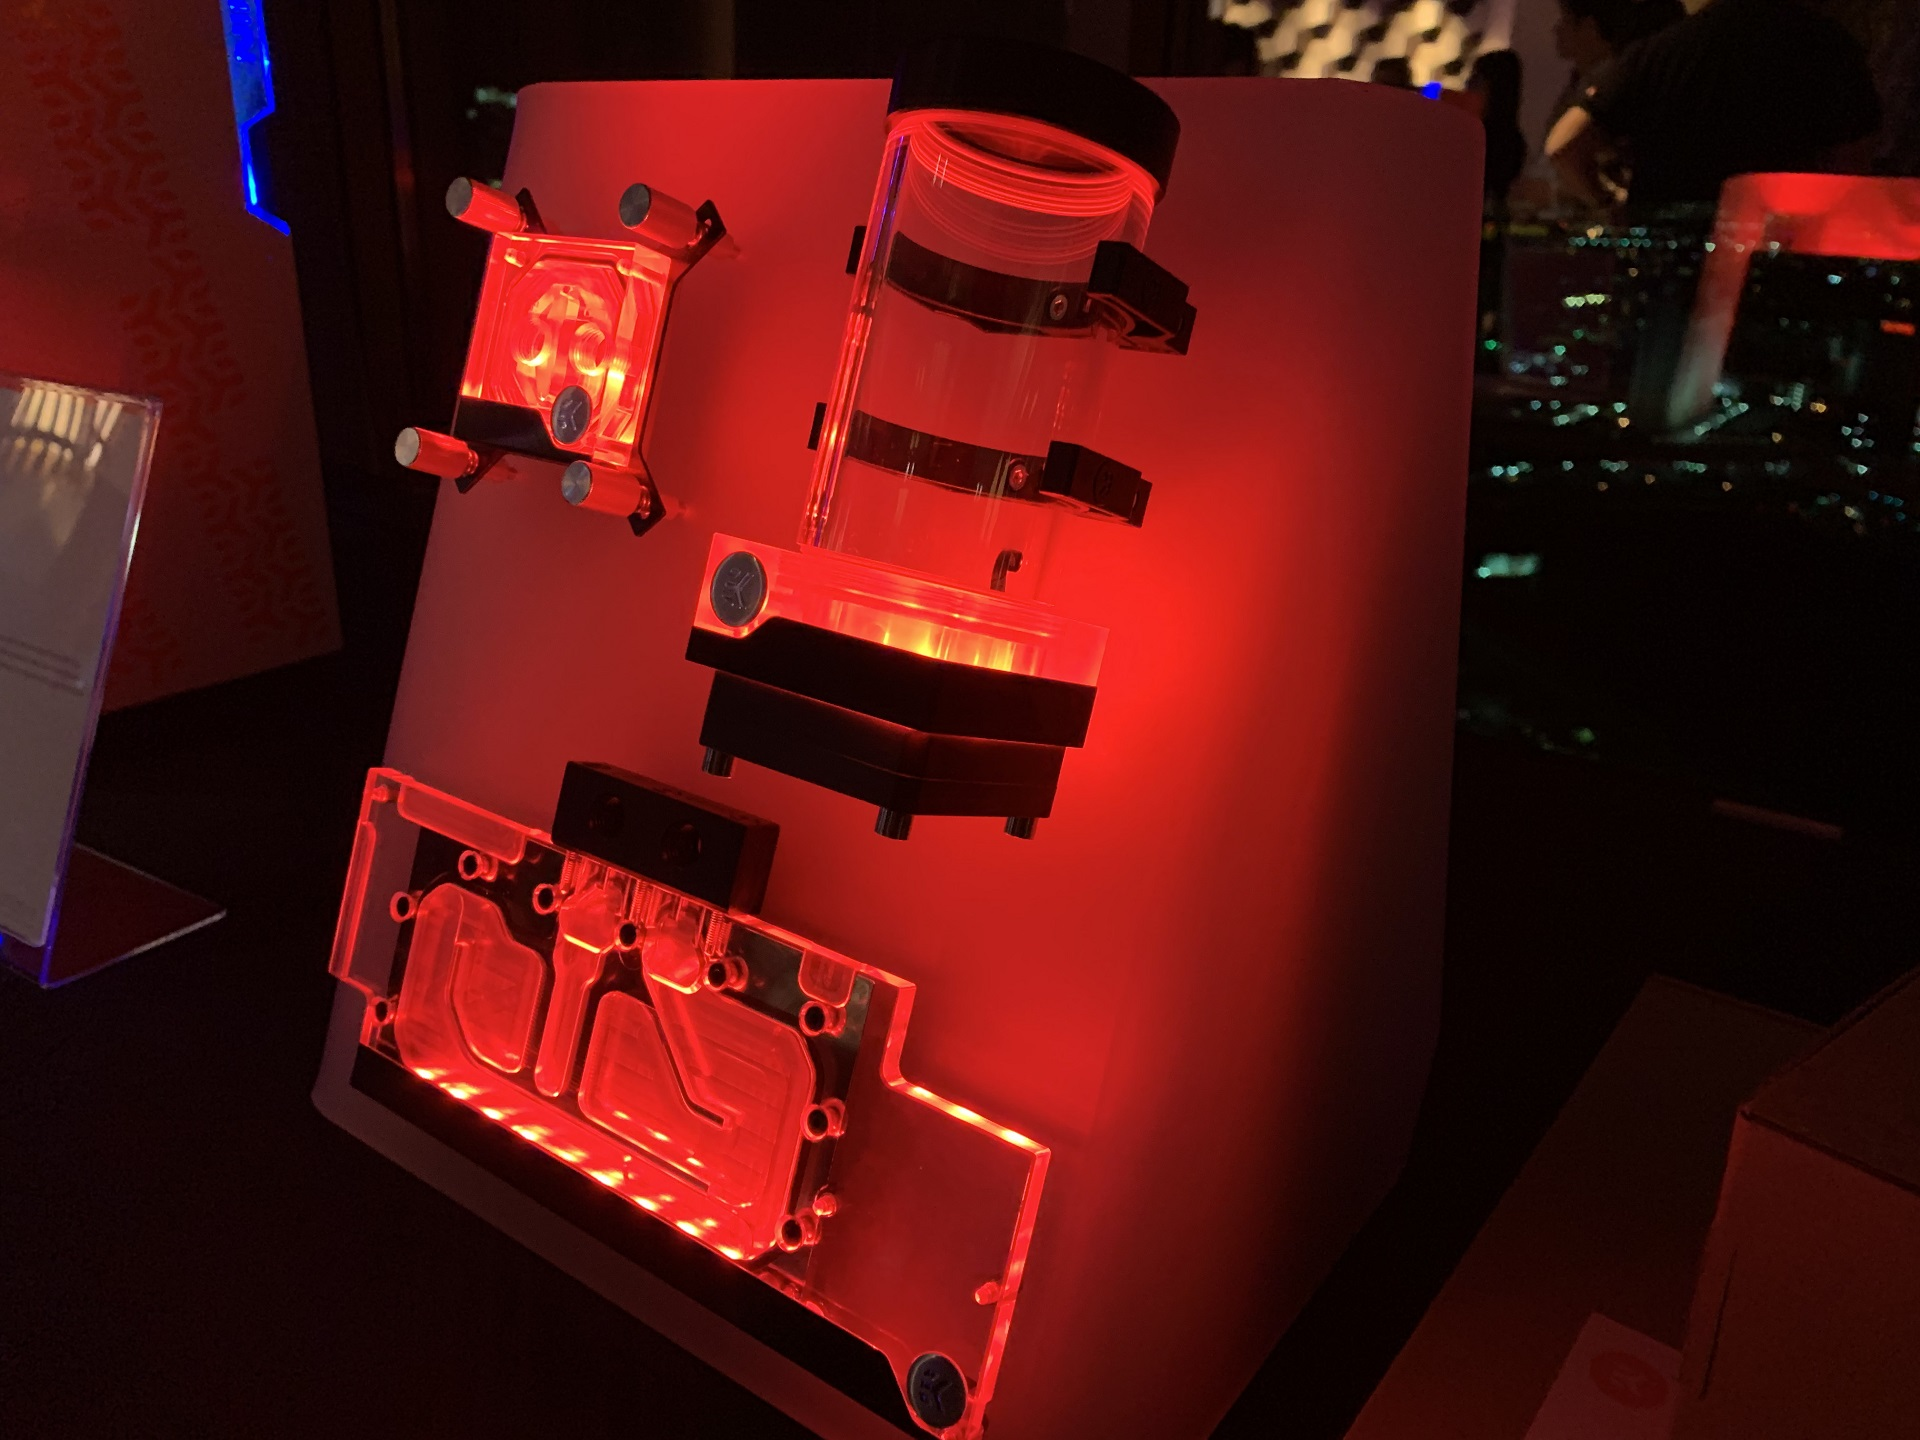 CES 2019 Roundup - PC Hardware Highlights! | bit-tech net